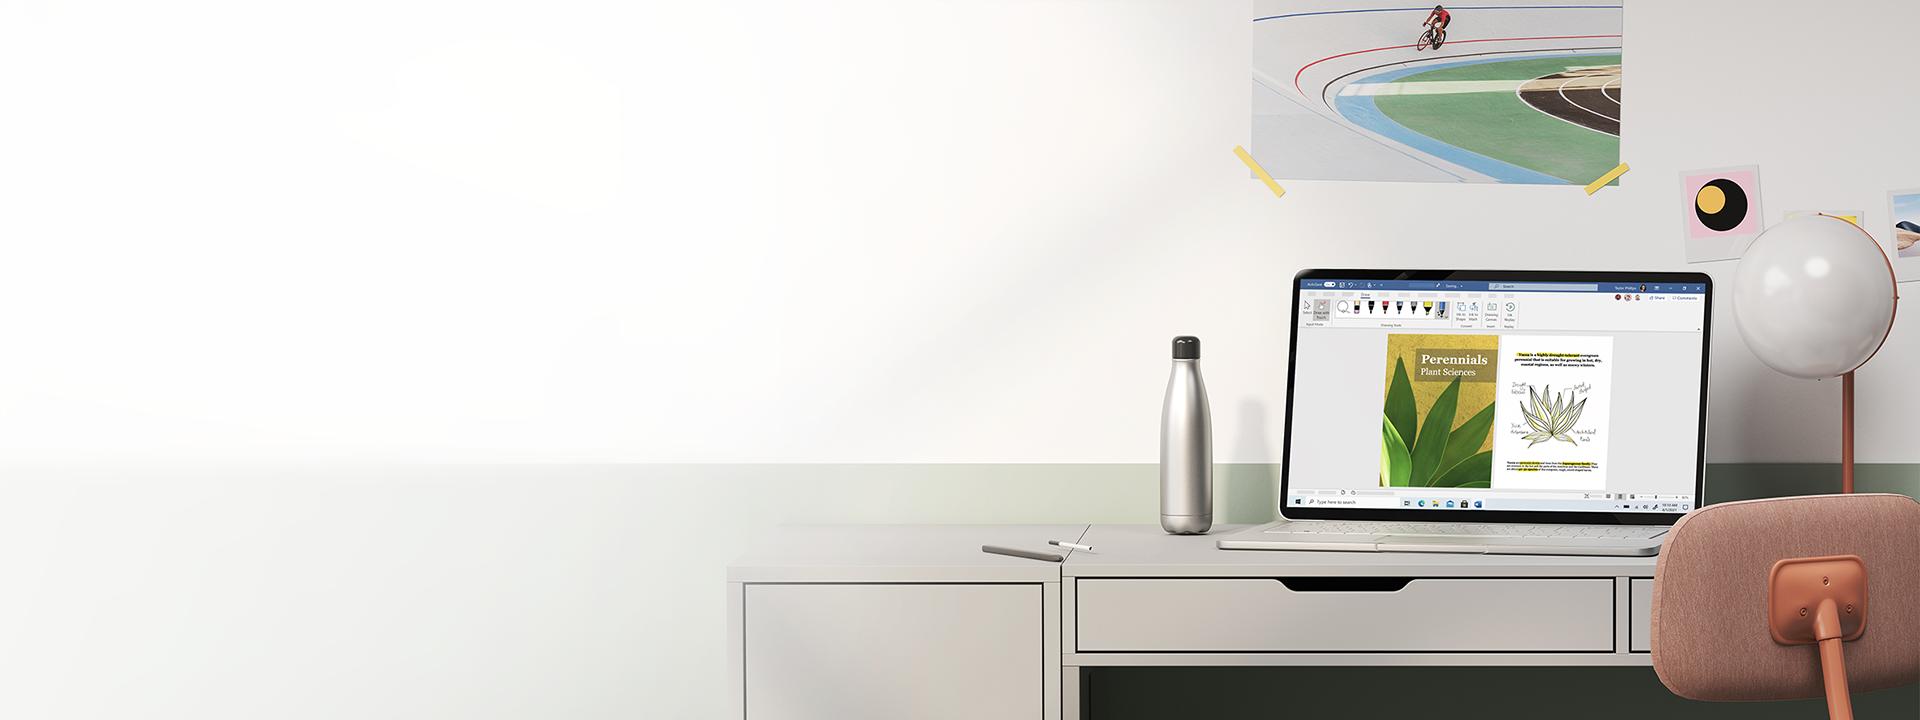 Windows10 laptop sitting on a desk